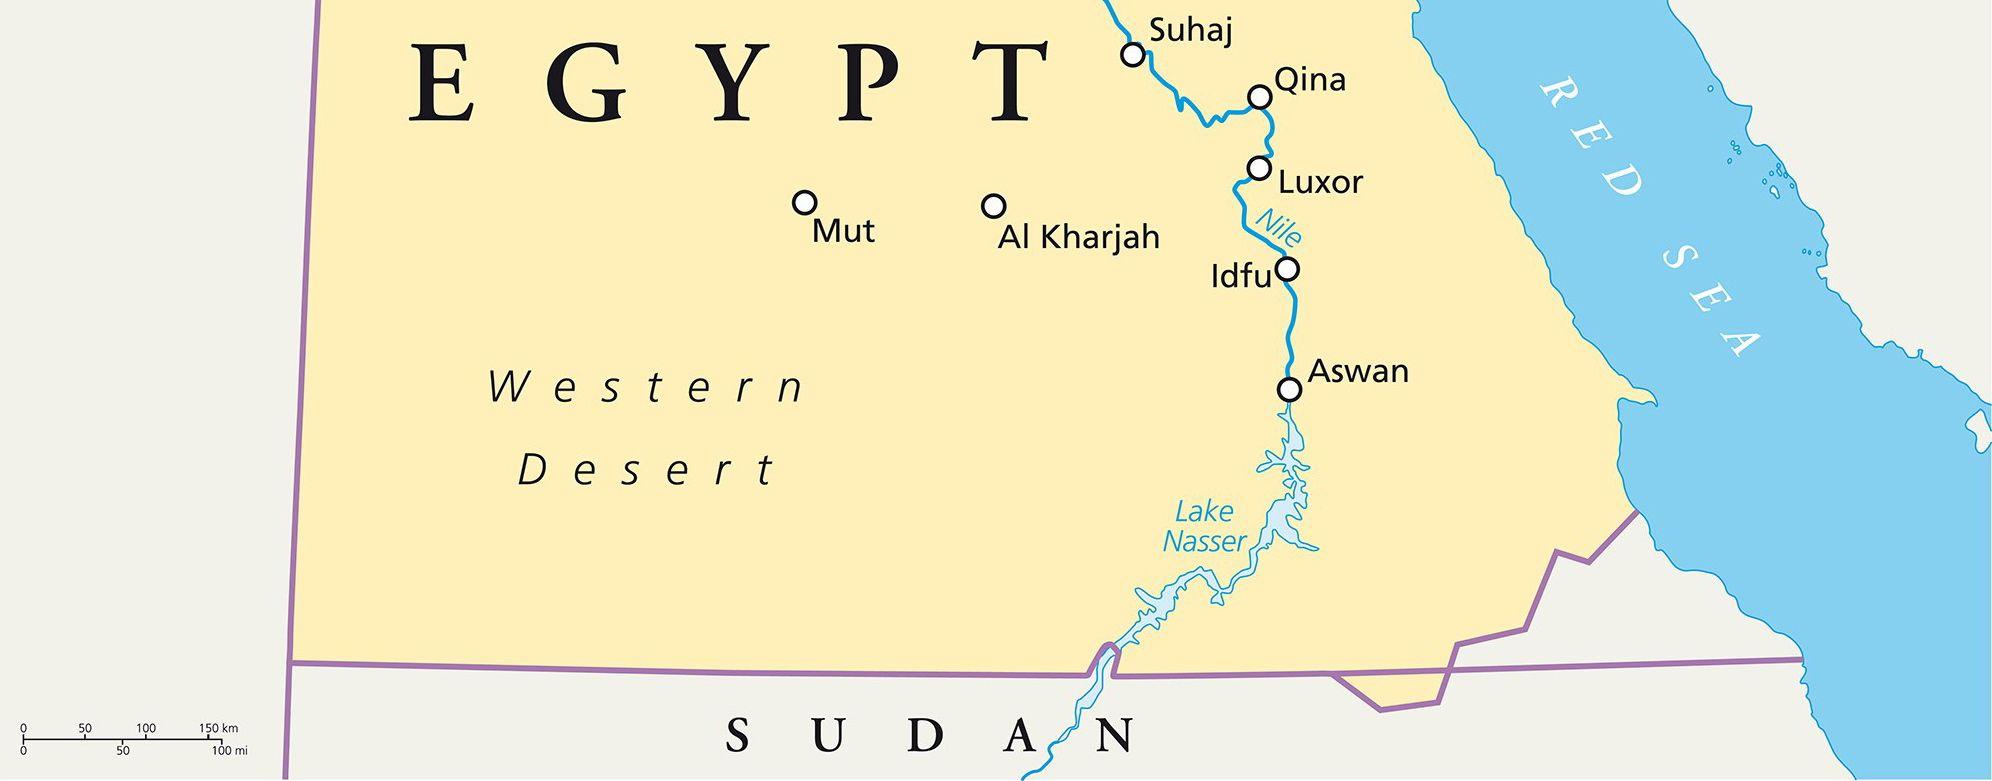 Egypt And Sudan Inaugurate New Border Crossing MadaMasr - Map of egypt and sudan